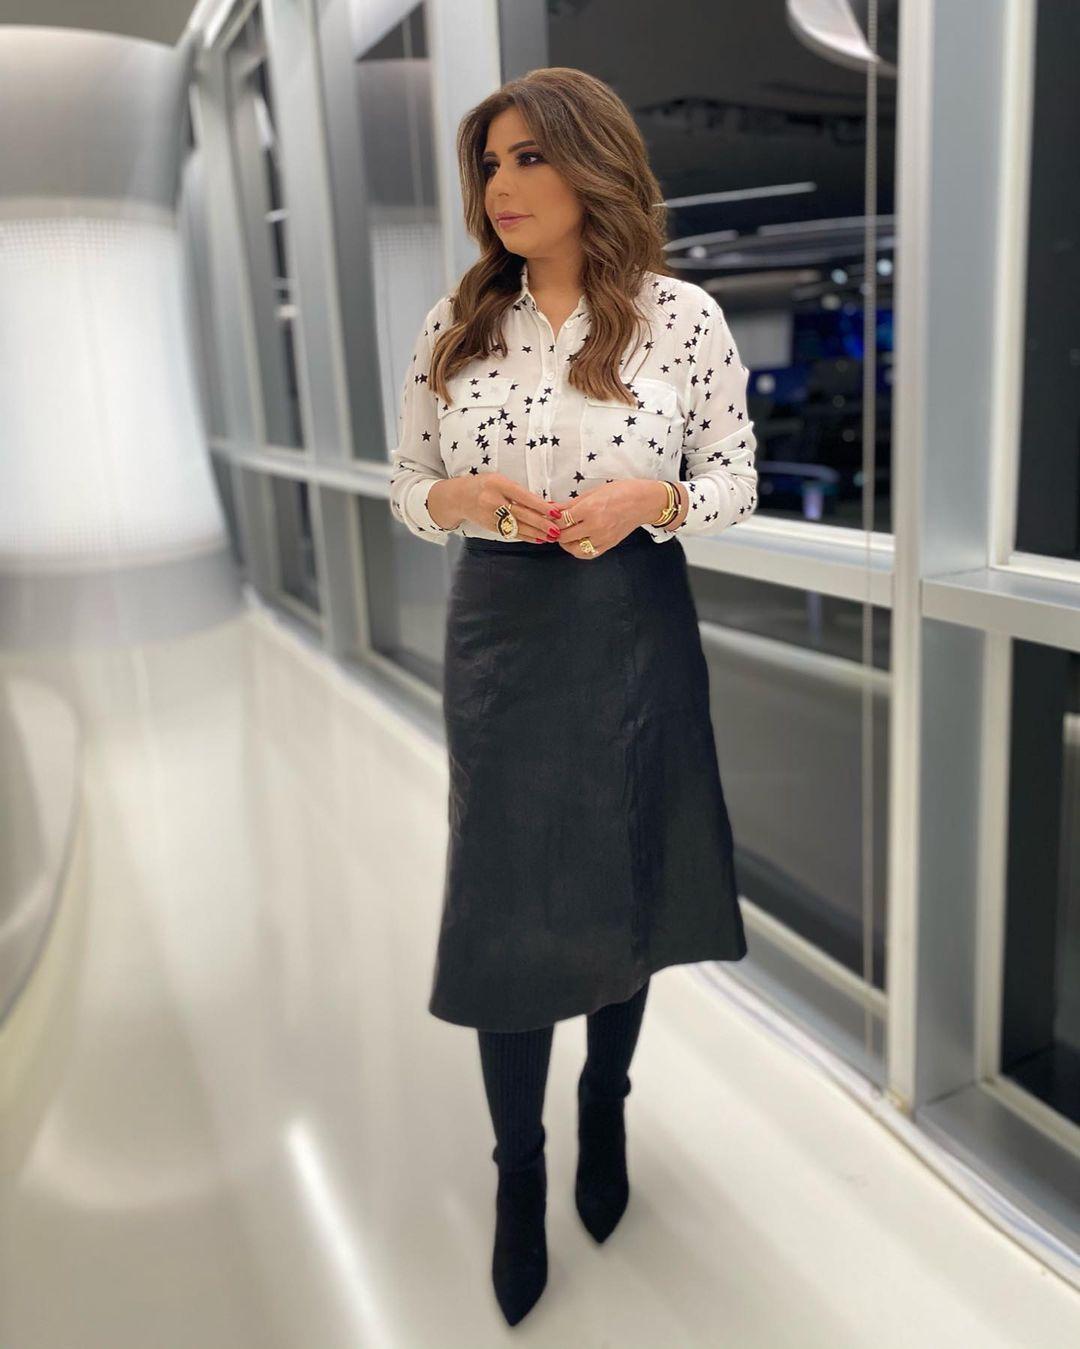 1 205 Curtidas 44 Comentarios Sarahdundarawy سارة دندراوي Sarahdundarawy No Instagram Winter Is Finally Here Style Fashion Chic